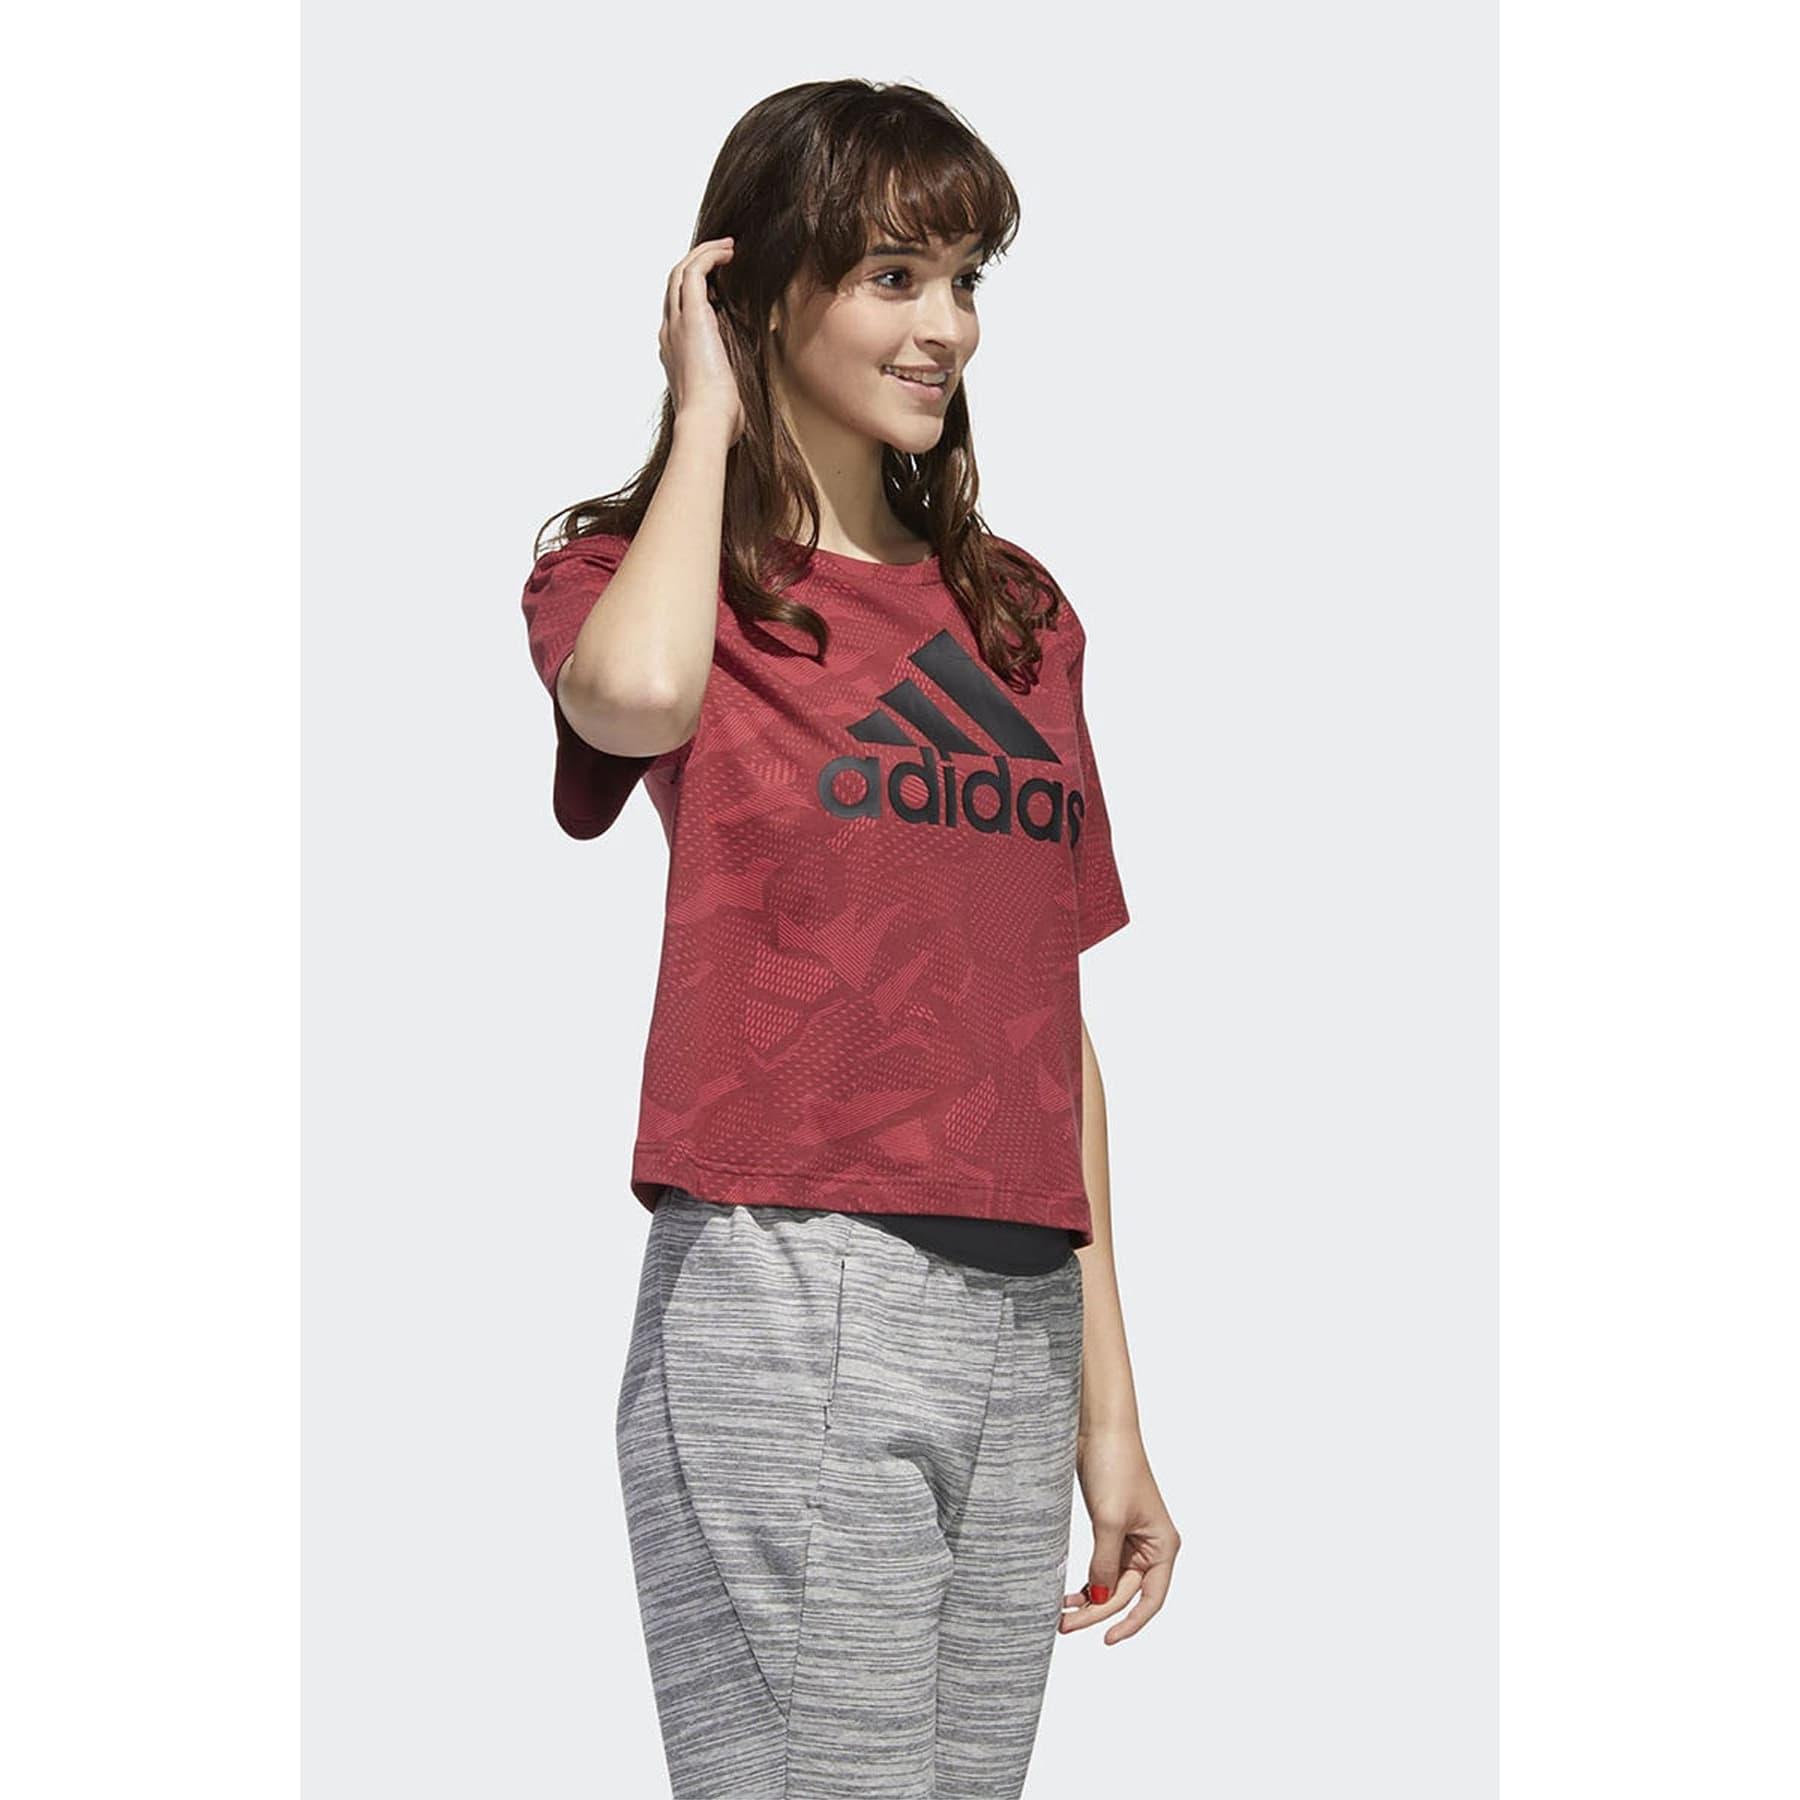 Essentials Allover Print Kadın Kırmızı Tişört (GE1142)